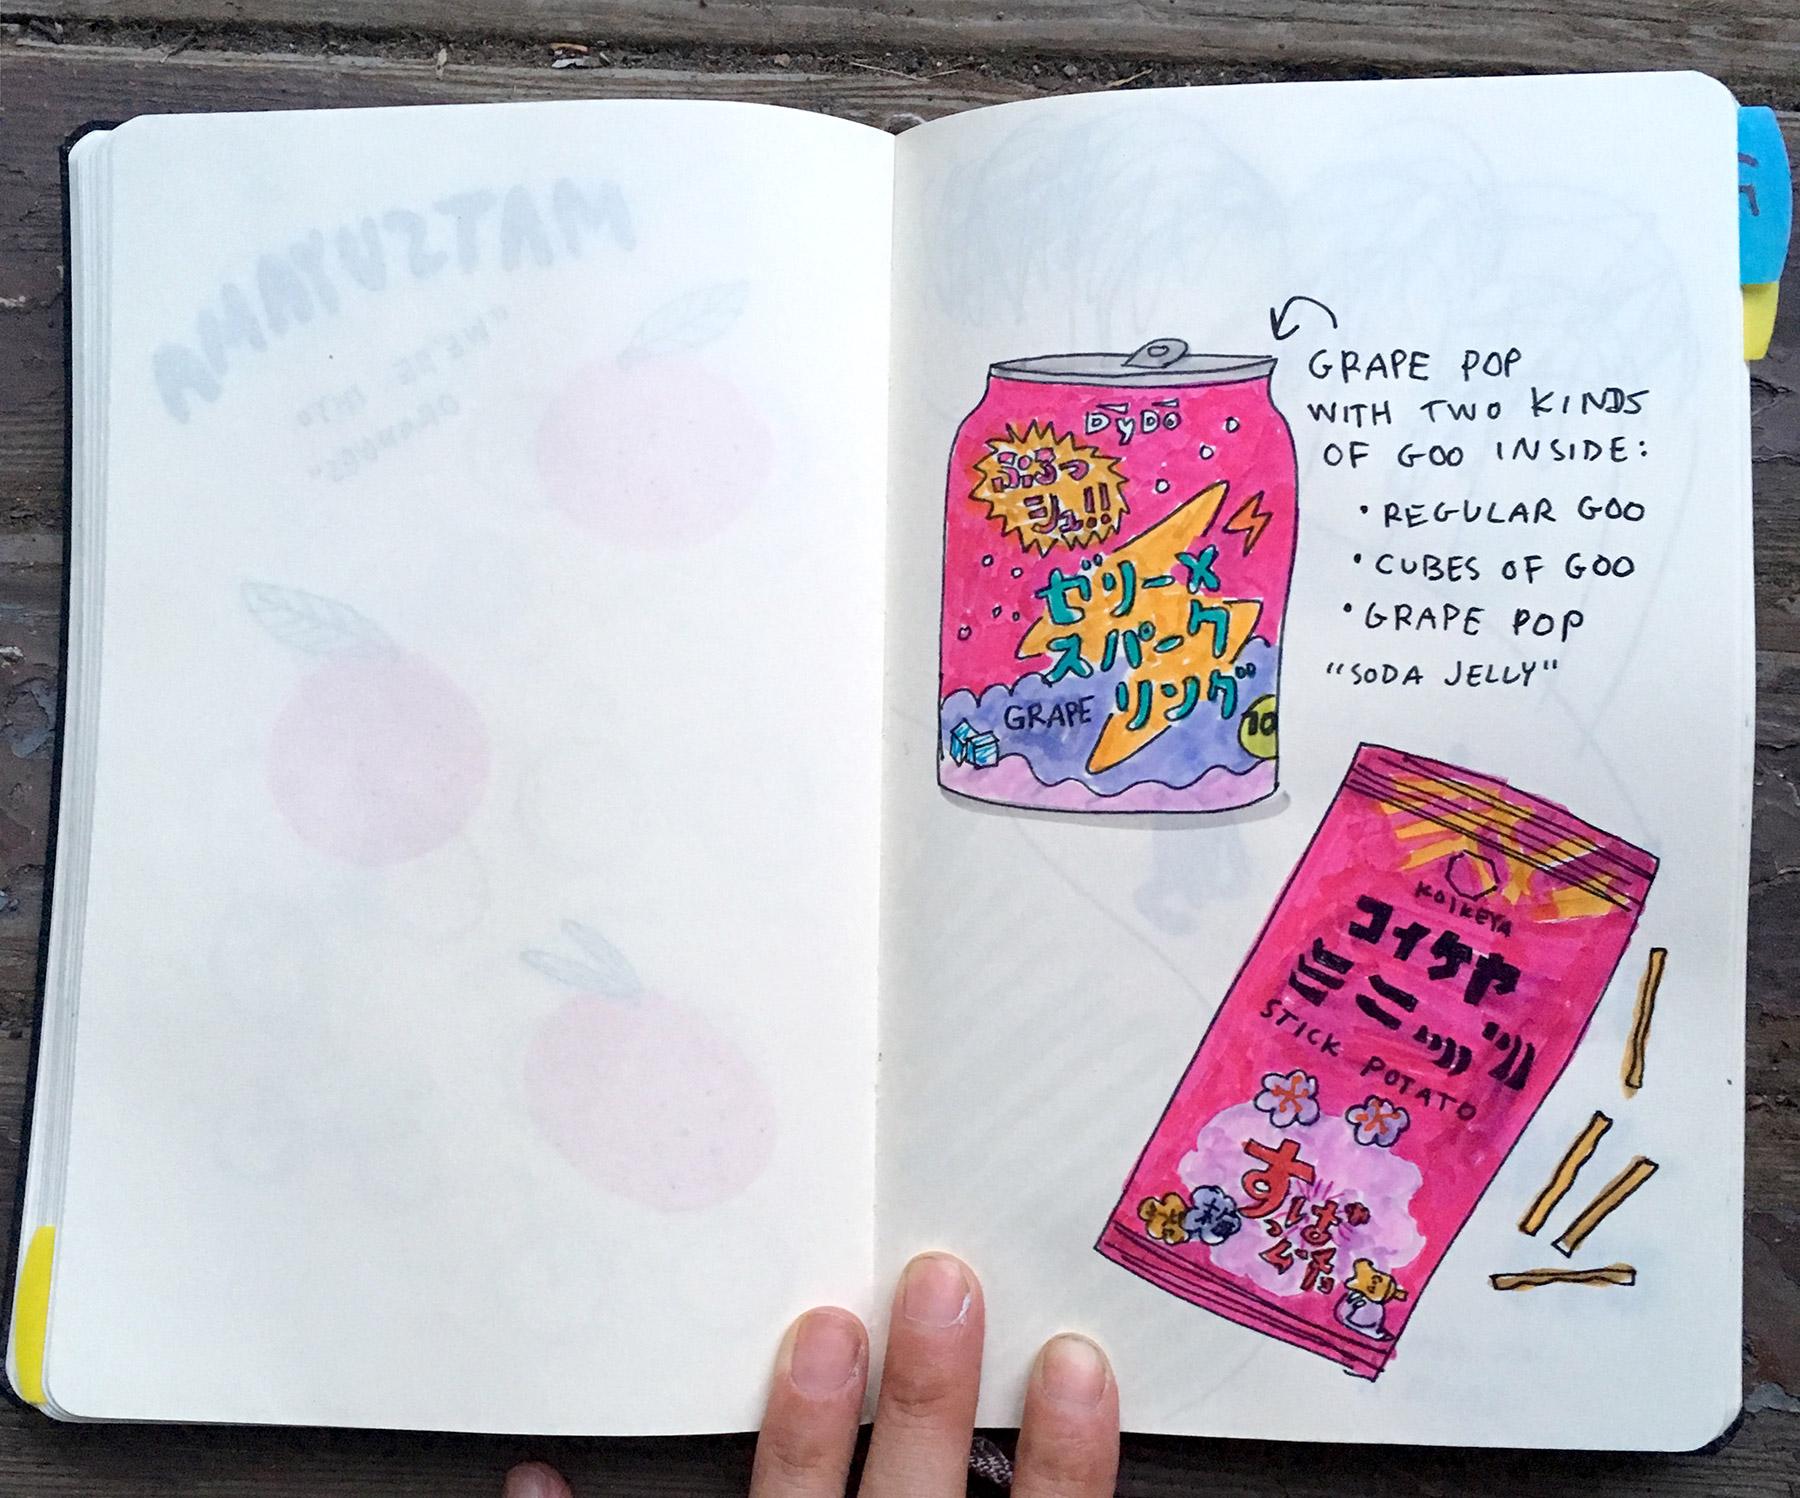 DyDo Soda Jelly from my Japan sketchbook